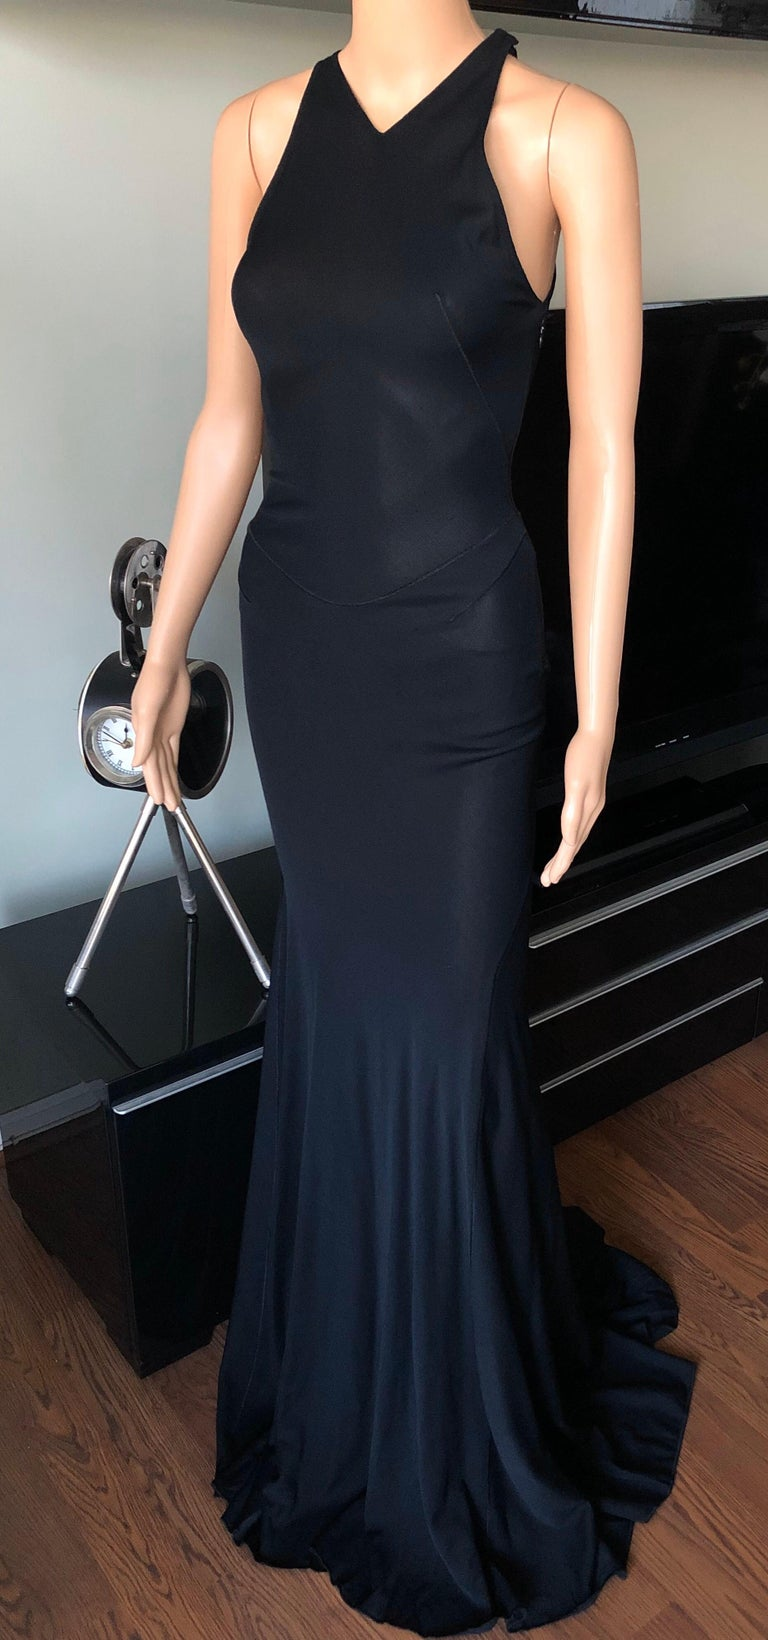 Azzedine Alaïa F/W 2001 Semi-Sheer Black Gown Maxi Dress For Sale 2